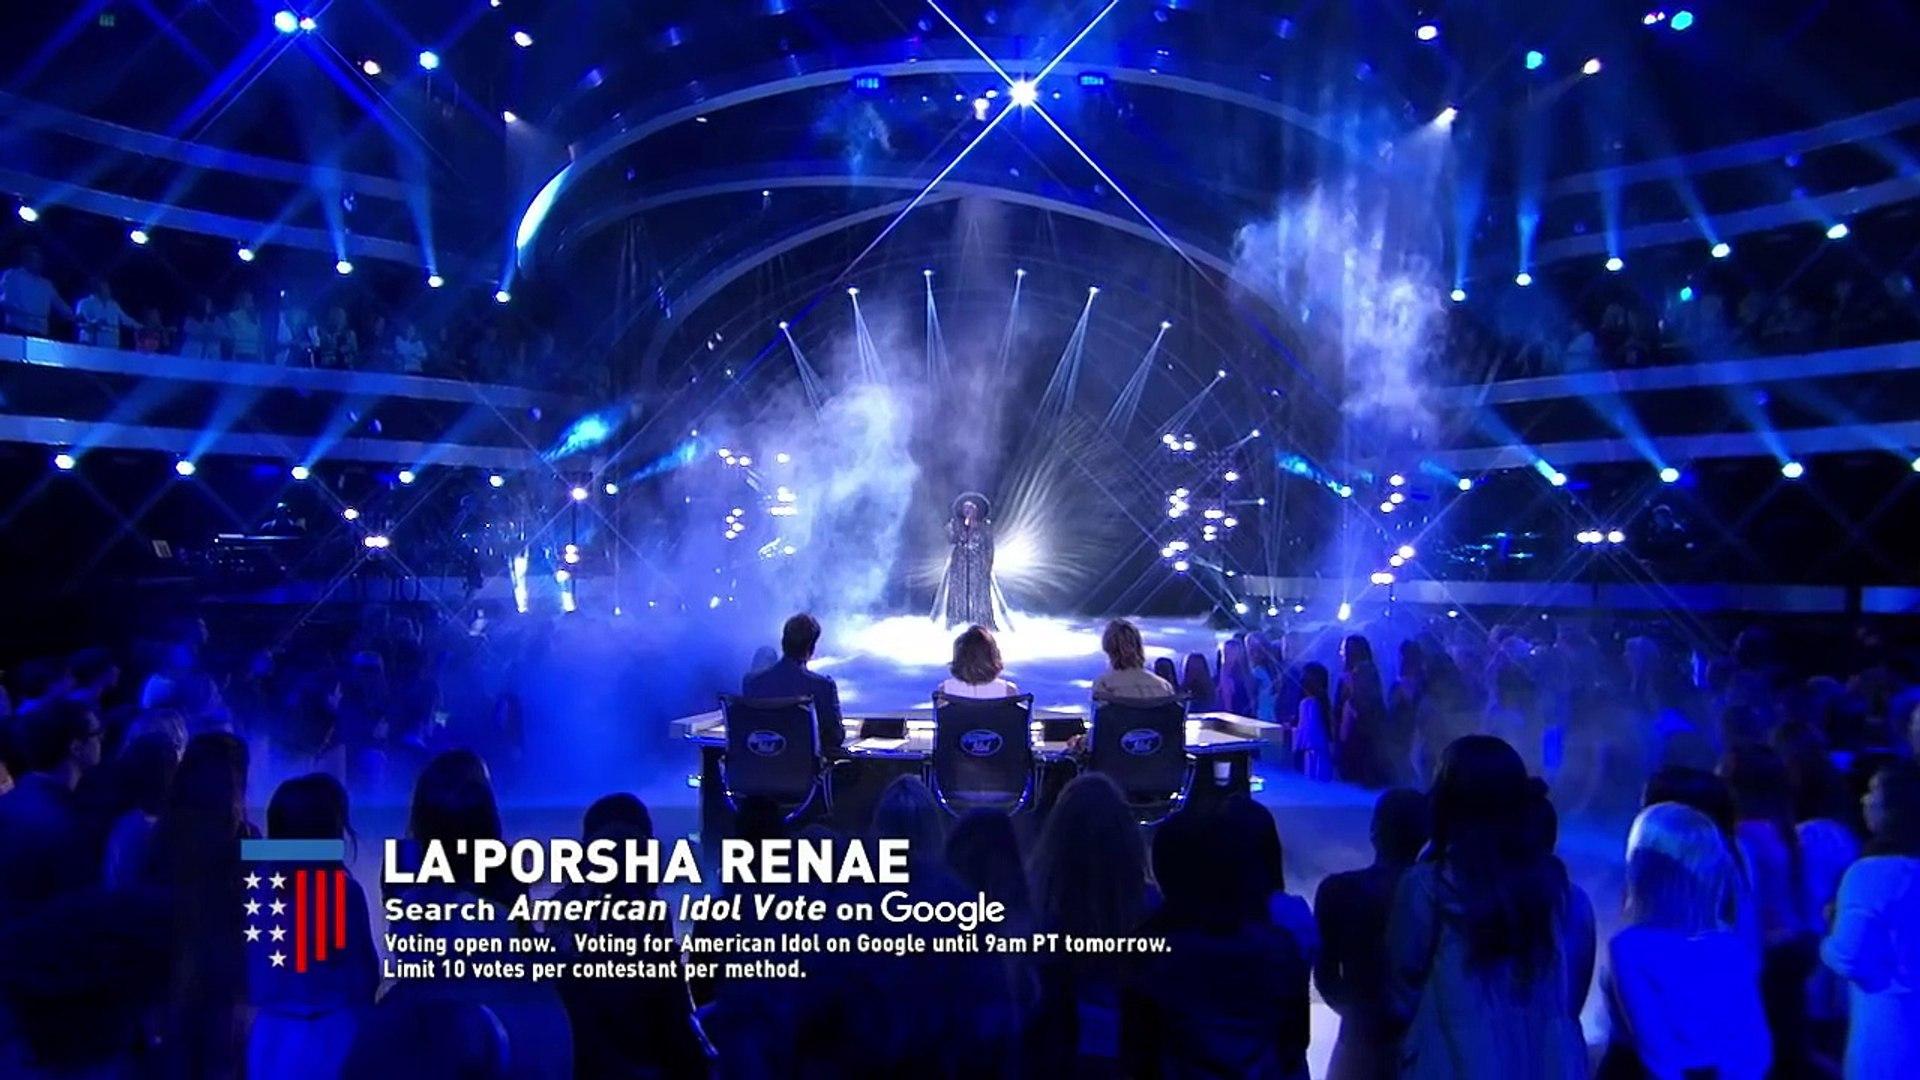 La'Porsha Renae - Top 8 - AMERICAN IDOL | AMERICAN IDOL-2016 | AMERICAN IDOL - SEASON 15